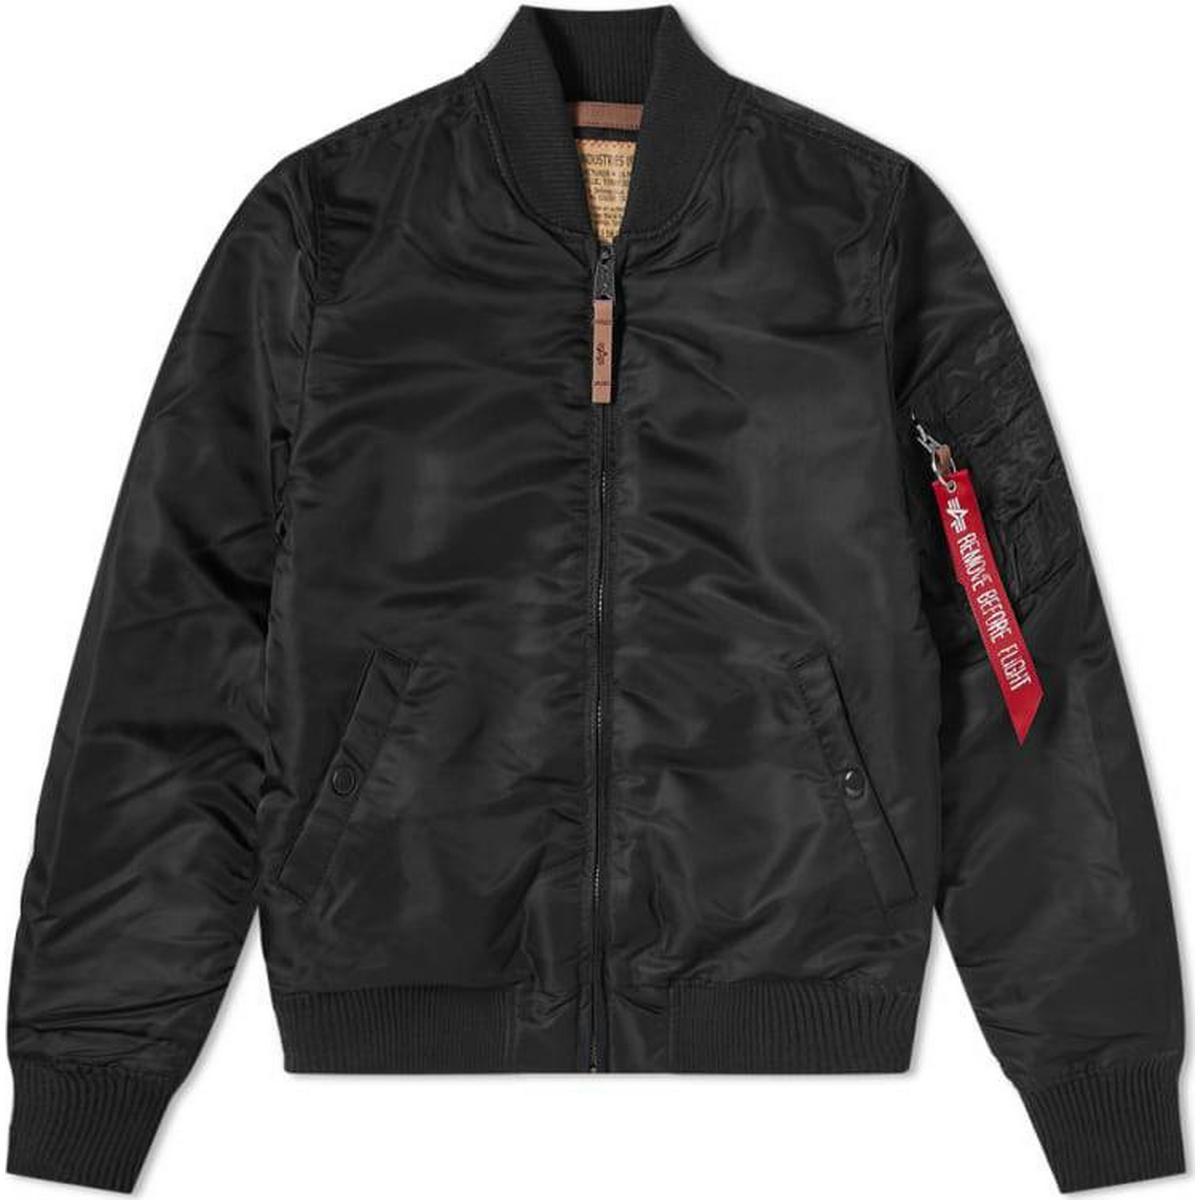 2cd42a5d3fd Alpha Industries Jackor Herrkläder - Jämför priser på Jacka PriceRunner